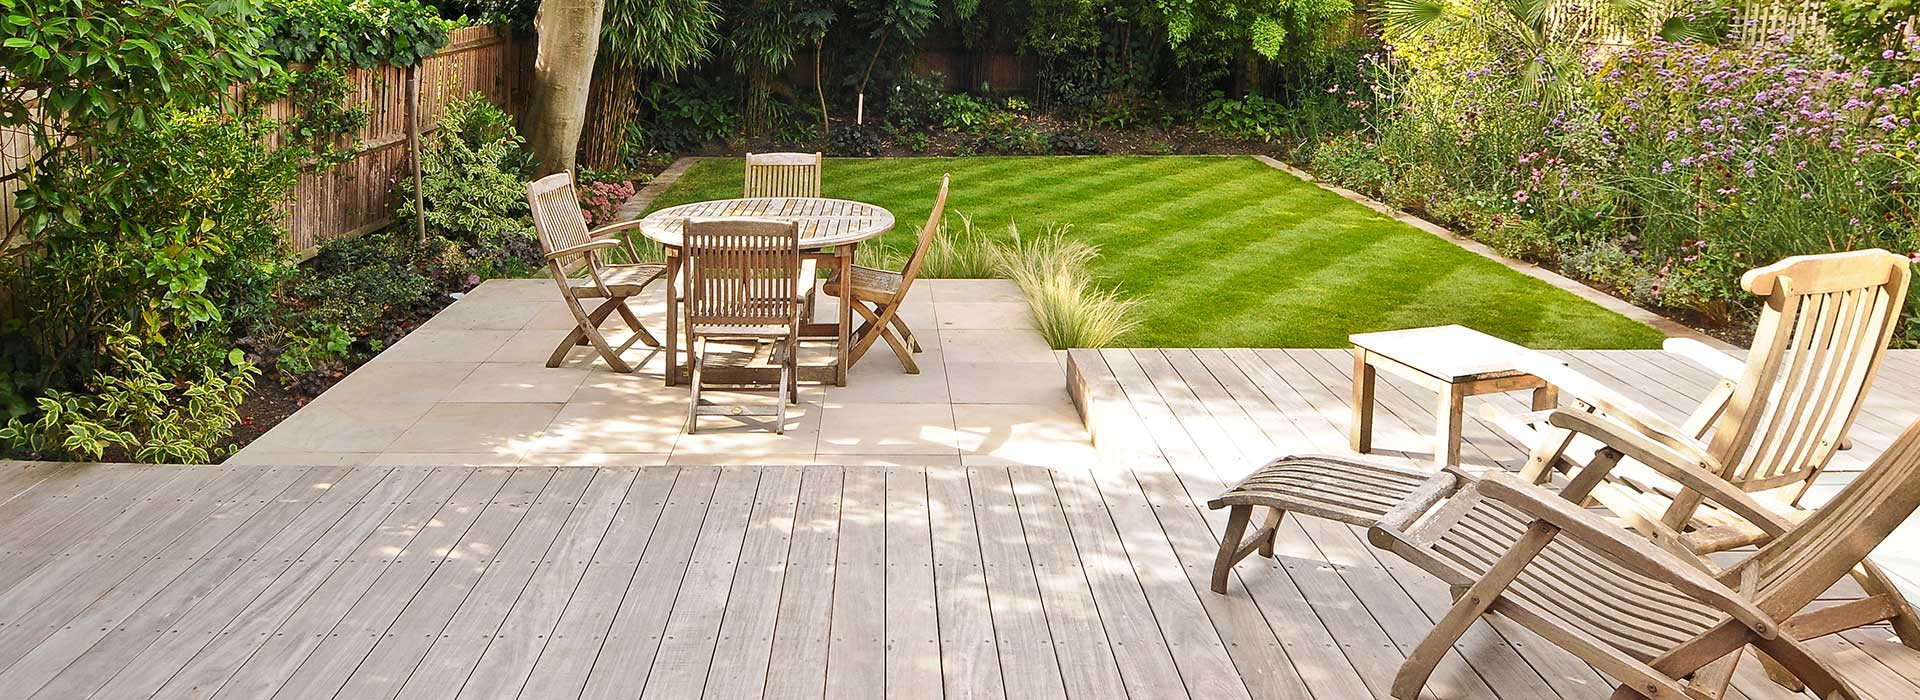 Garden Design London kate eyre landscape & garden design london